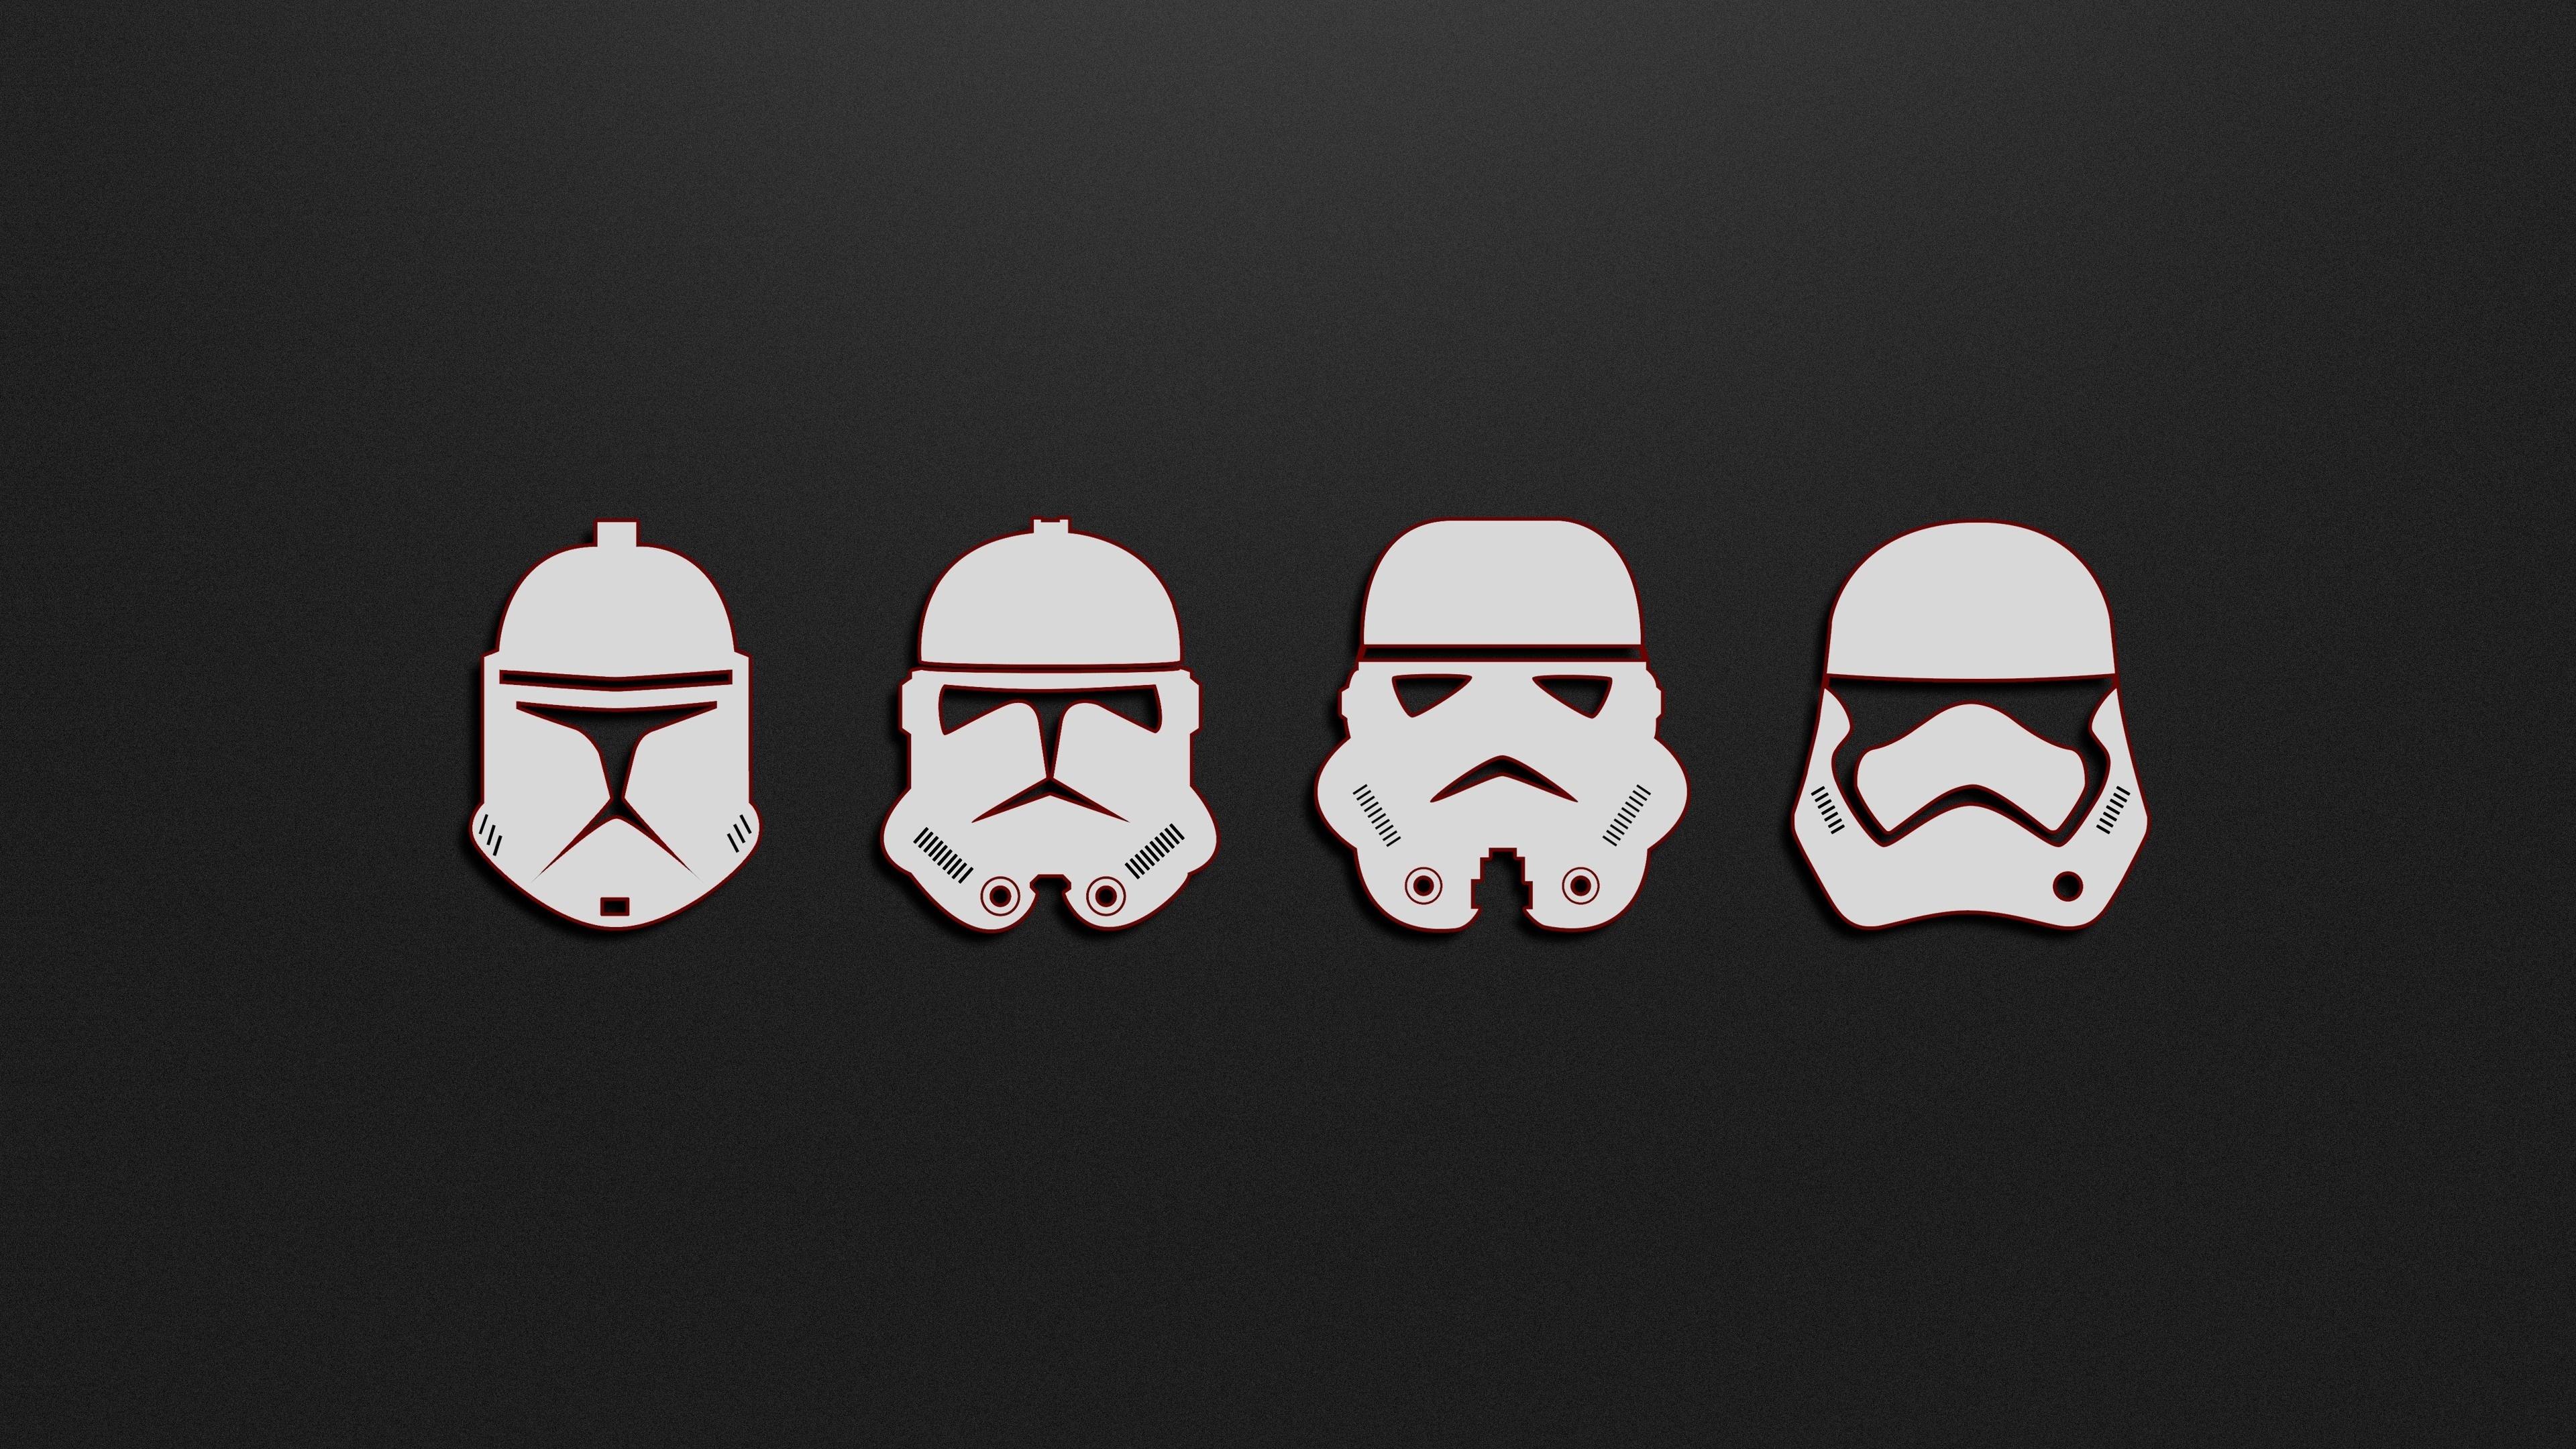 Minimal Soldiers Stormtrooper Star Wars Wallpaper Star Wars Wallpaper Laptop 3840x2160 Wallpaper Teahub Io